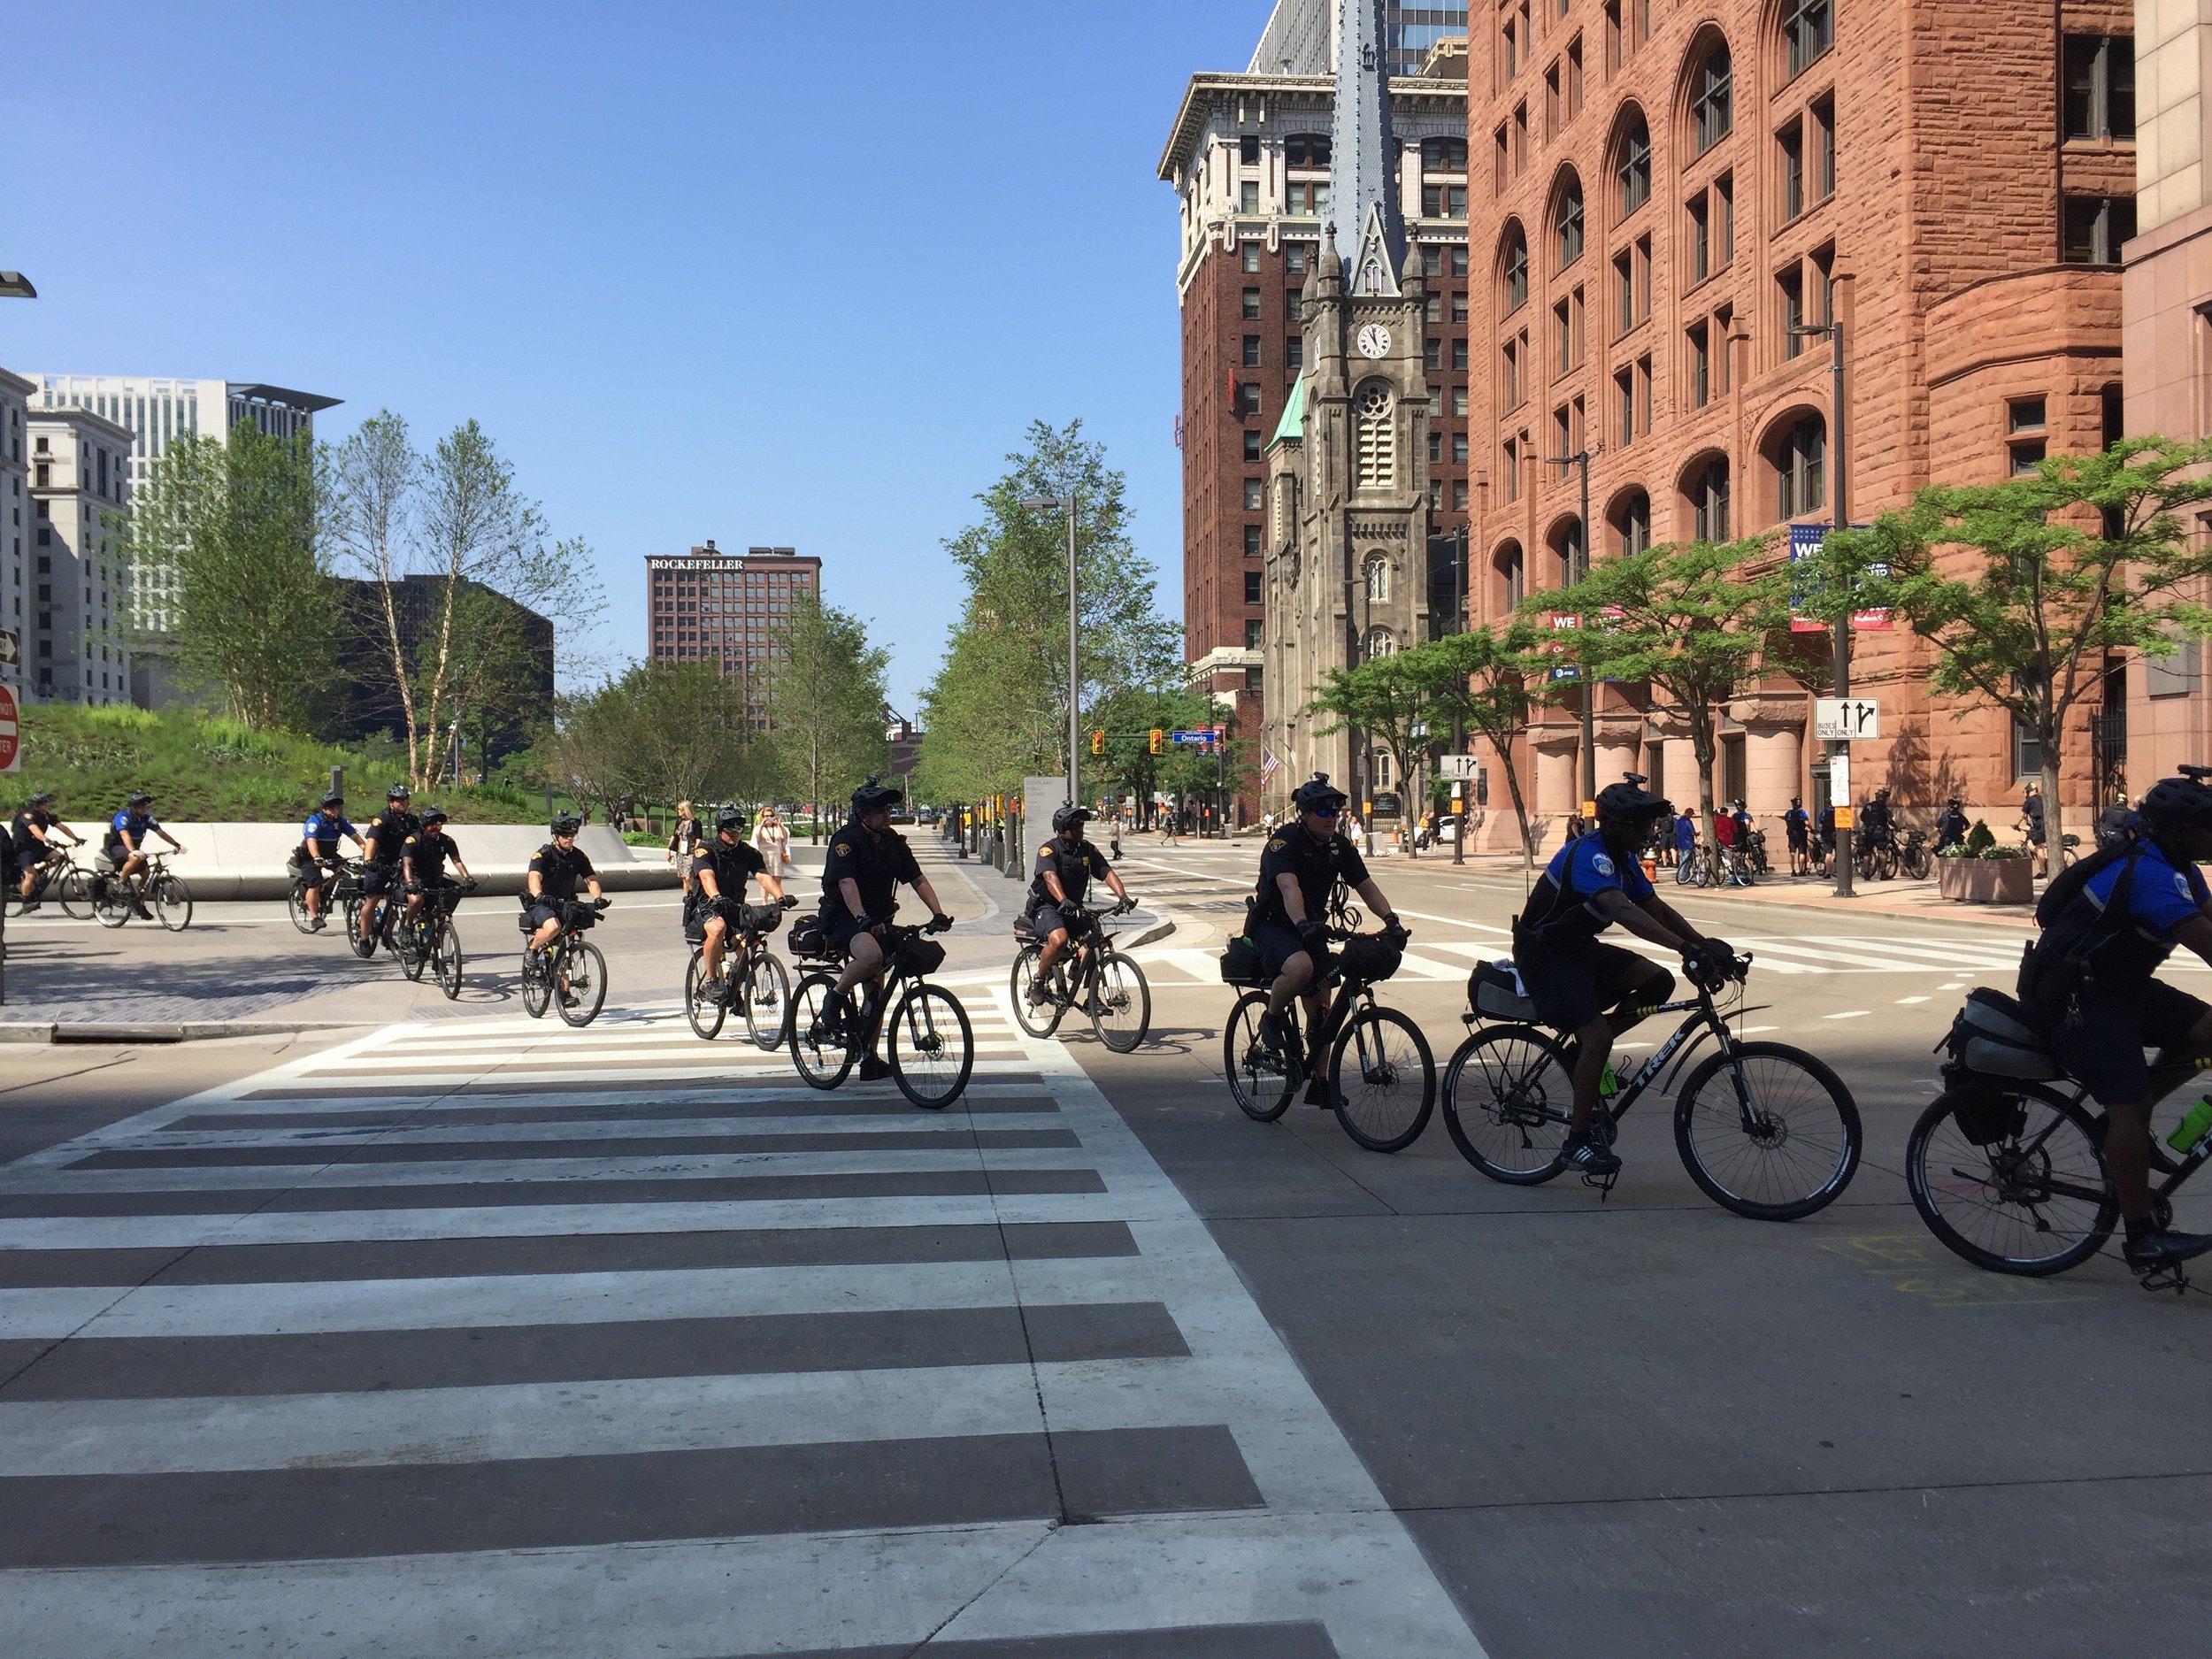 The Bicycle Patrol